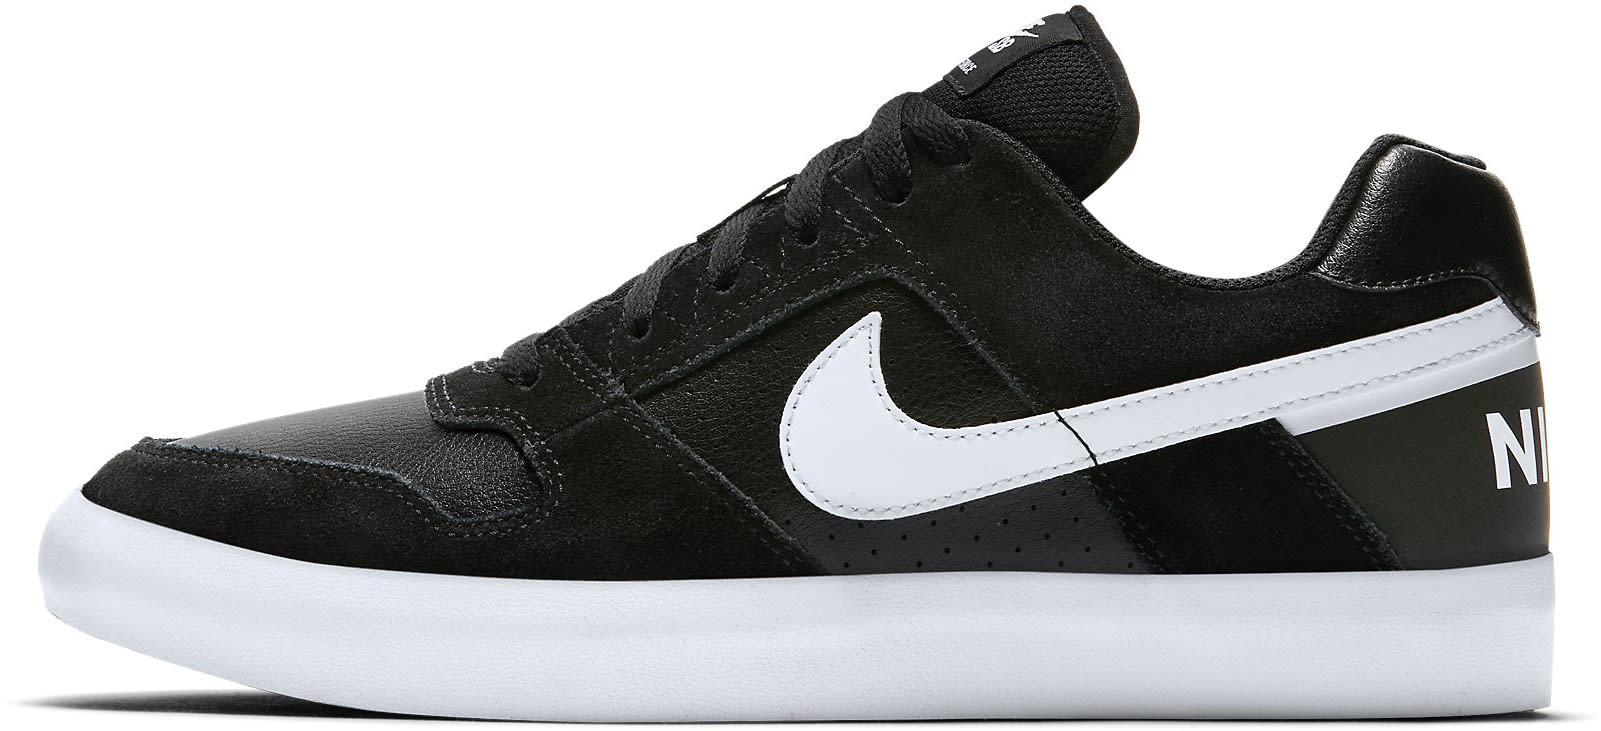 pretty nice 8d9bf d0762 Nike SB Delta Force Vulc Skate Shoes - thumbnail 1